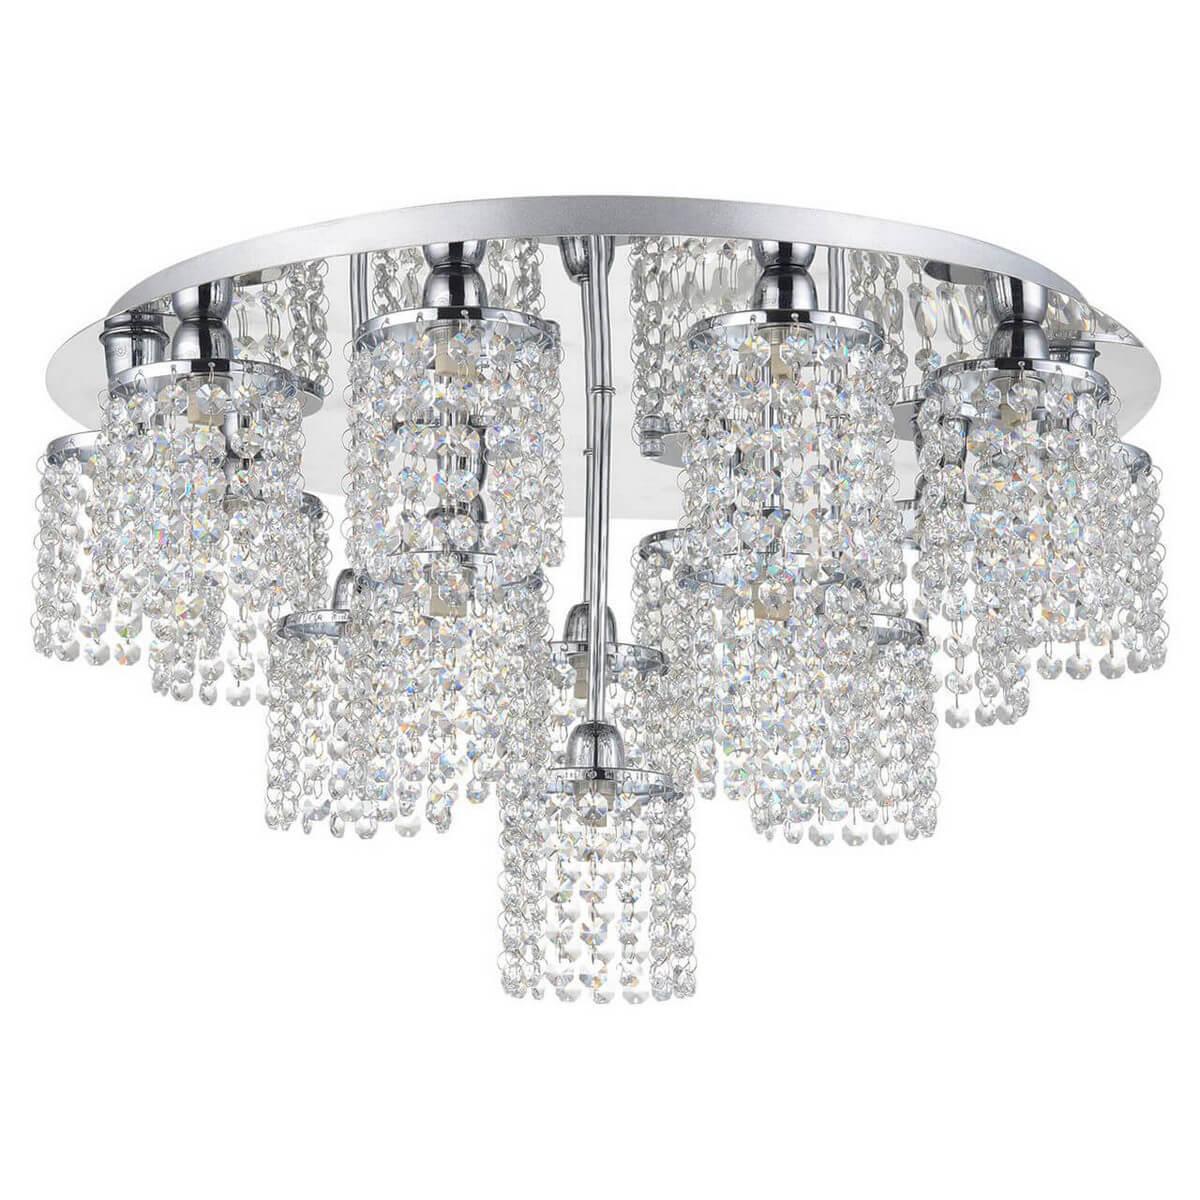 все цены на Потолочная люстра Lussole Monteleto LSJ-0407-16 онлайн